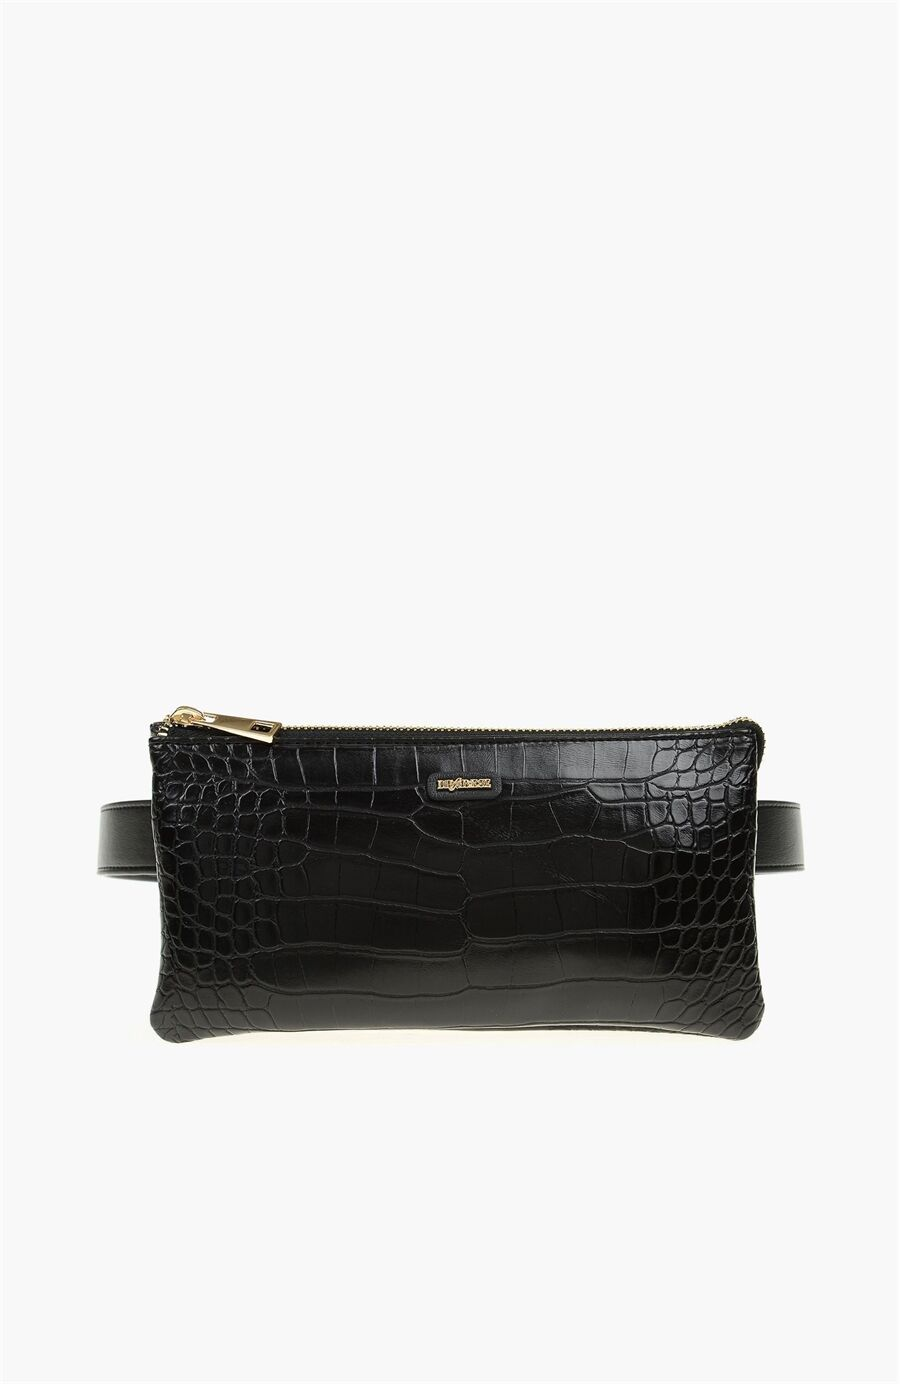 Dıvarese Krokodil Desenli Siyah Clutch – 299.0 TL